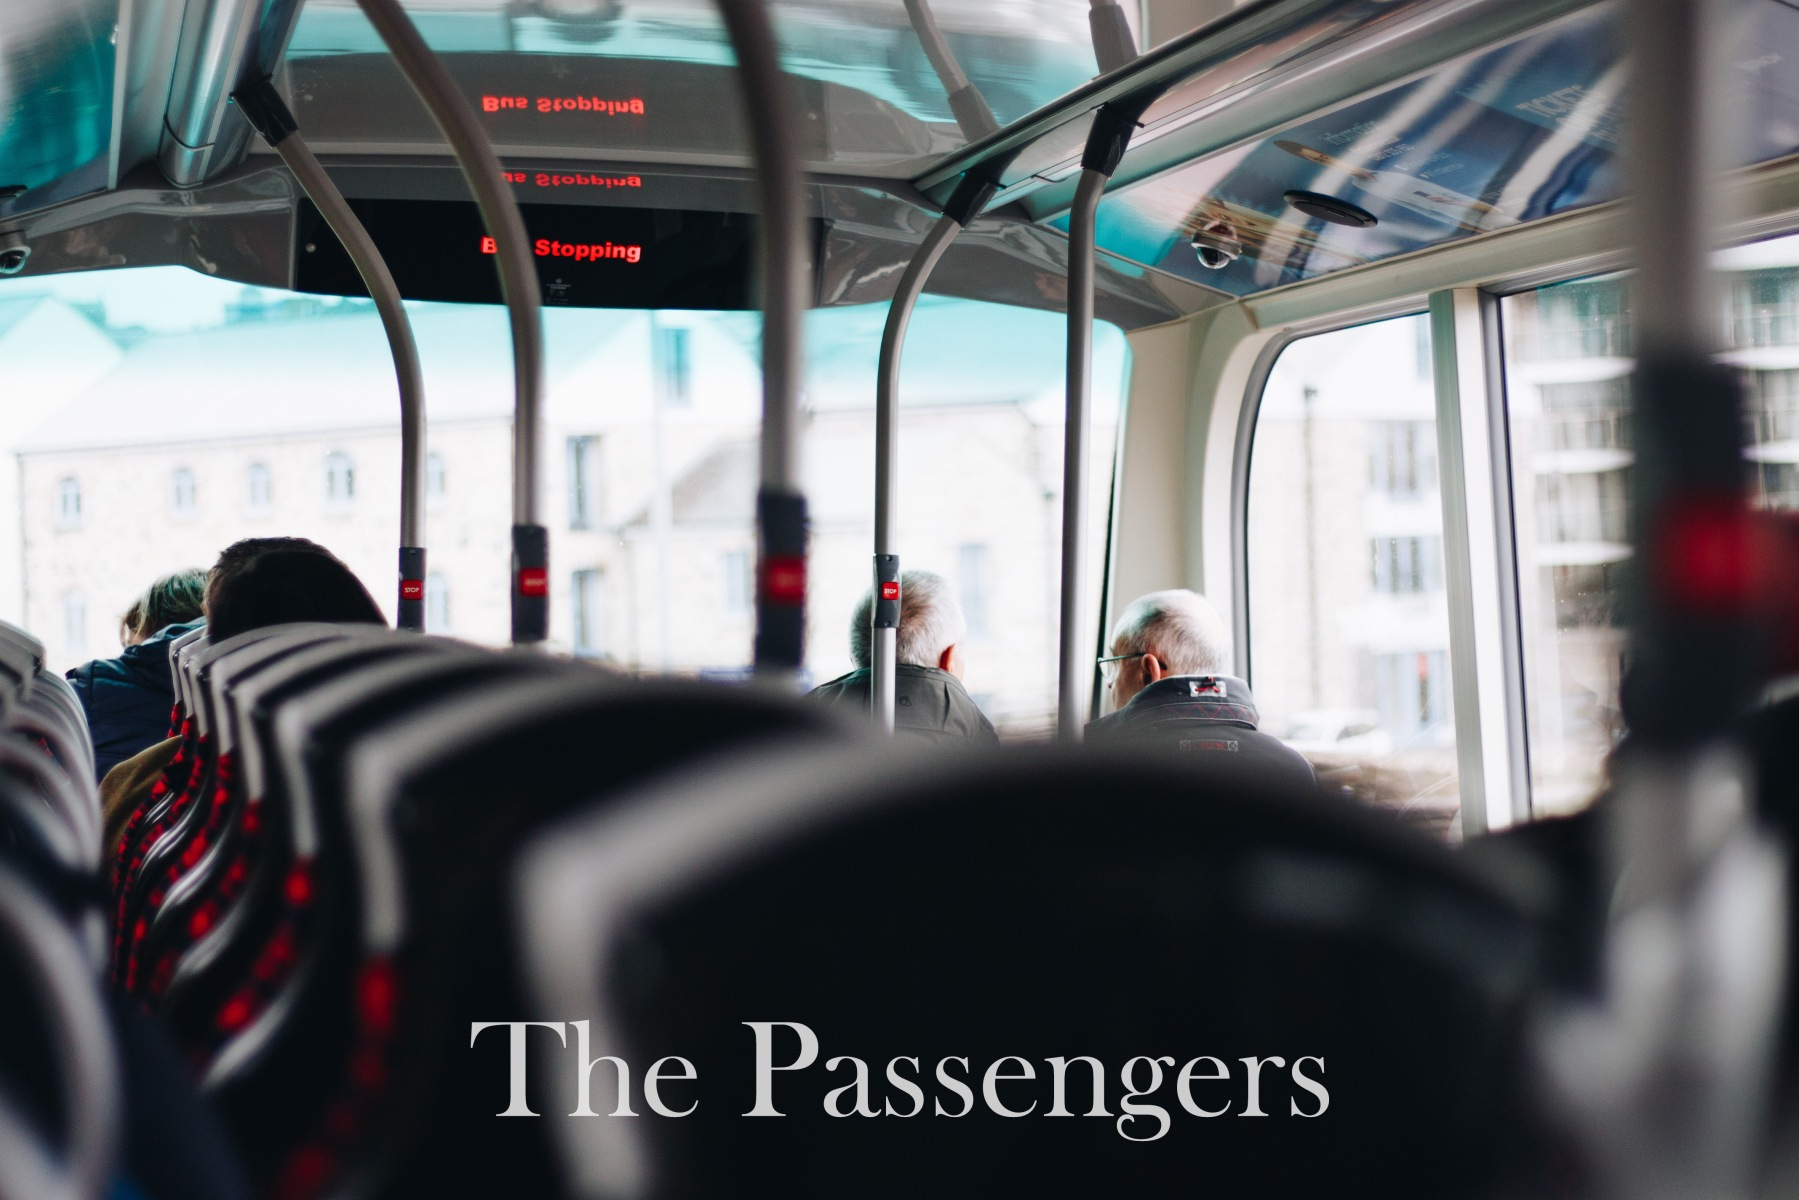 11. The Passengers